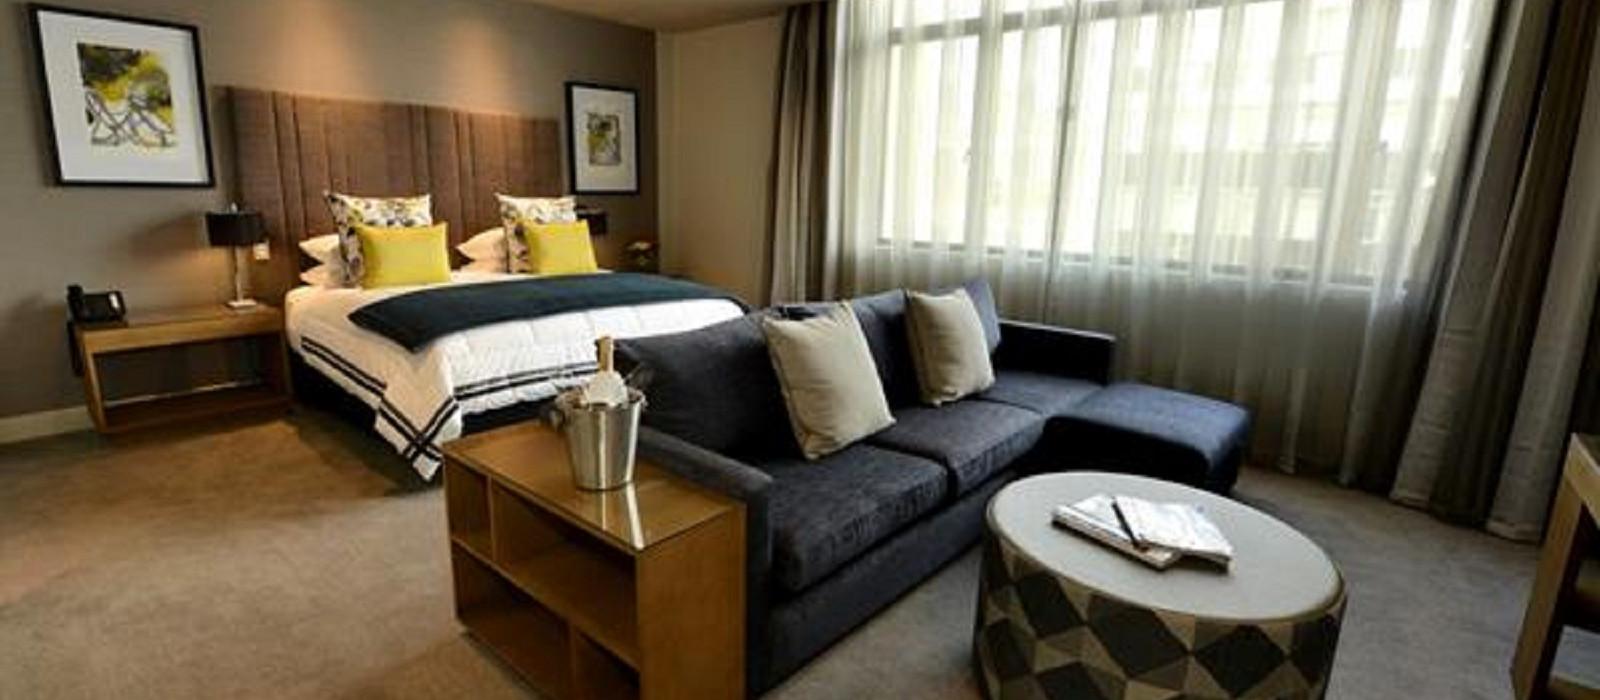 Hotel Distinction Dunedin New Zealand